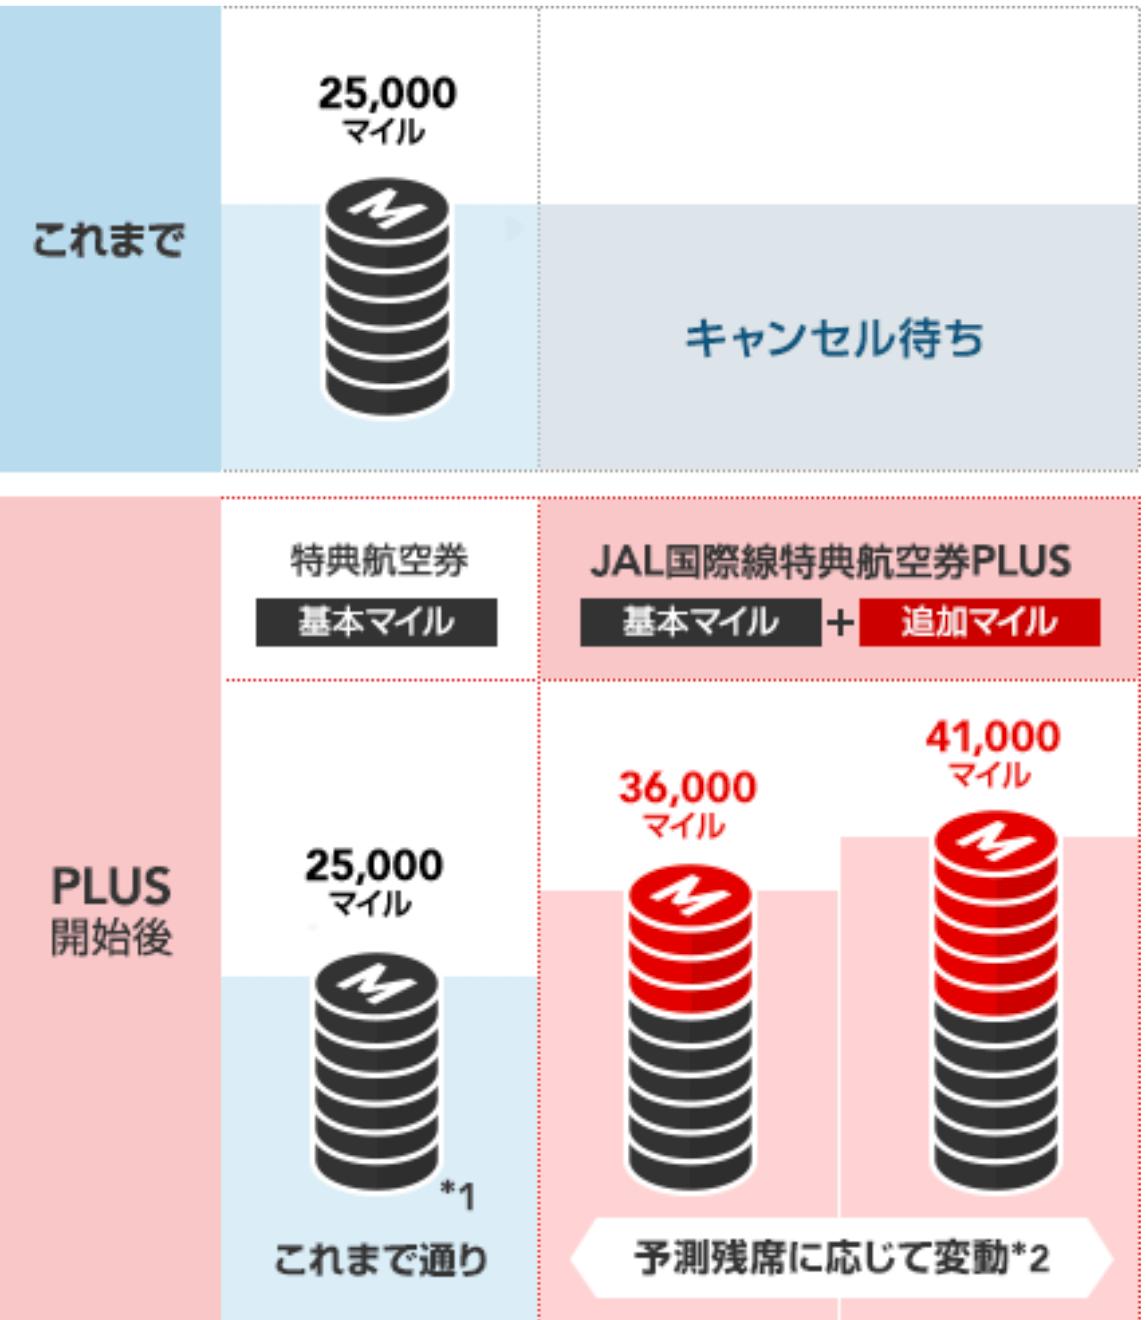 JAL国際線特典航空券PLUS図解